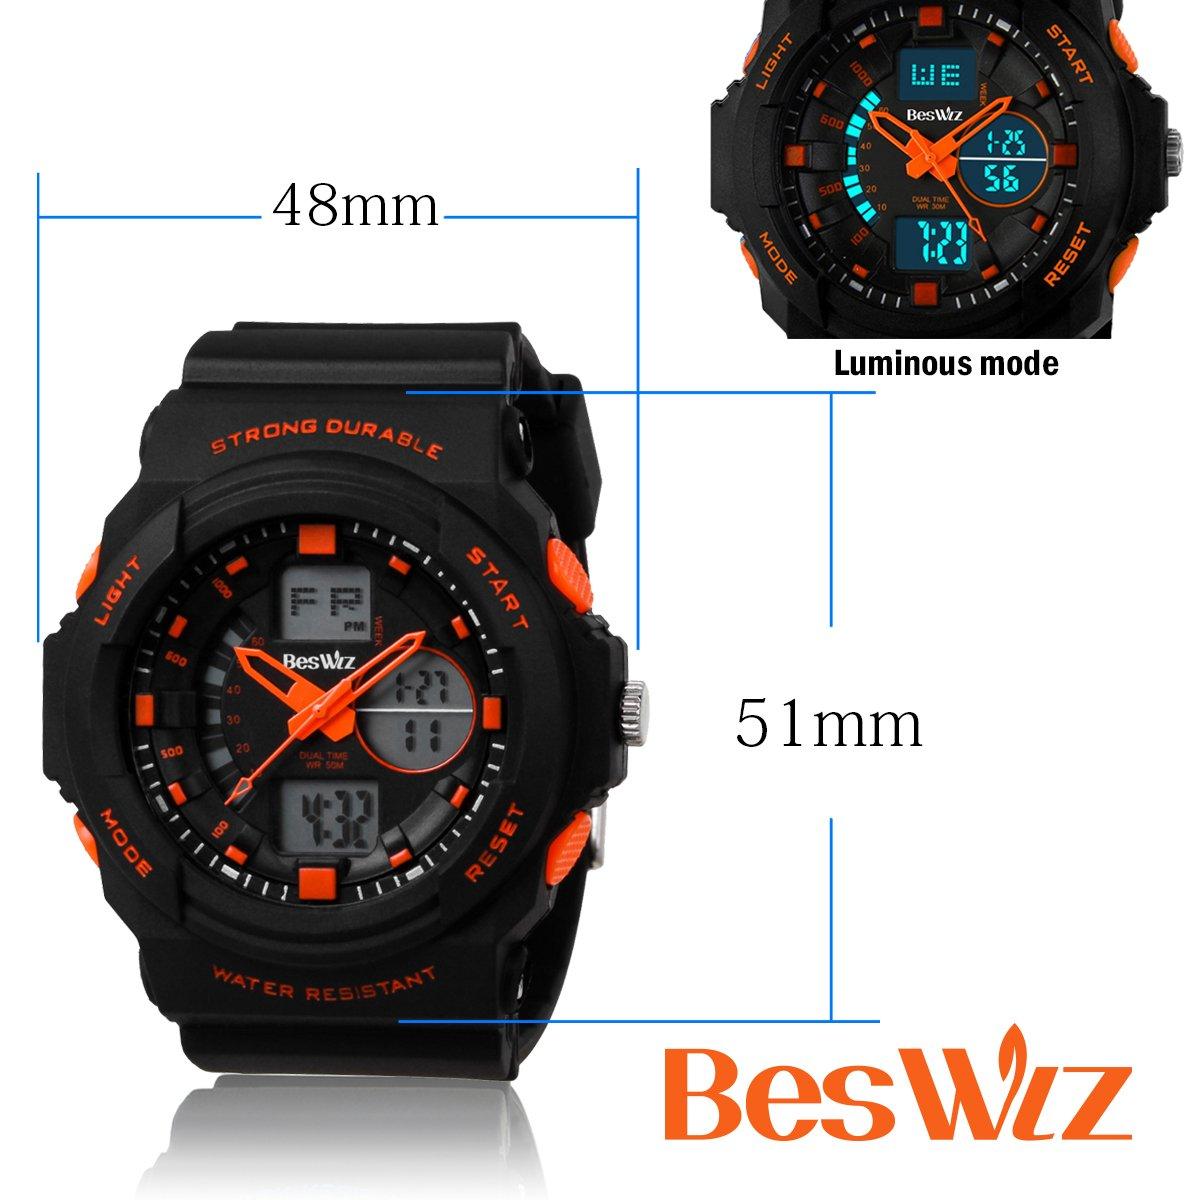 BesWLZ Multi Function Digital LED Quartz Watch Water Resistant Electronic Sport Watches Child Orange by BesWlz (Image #3)